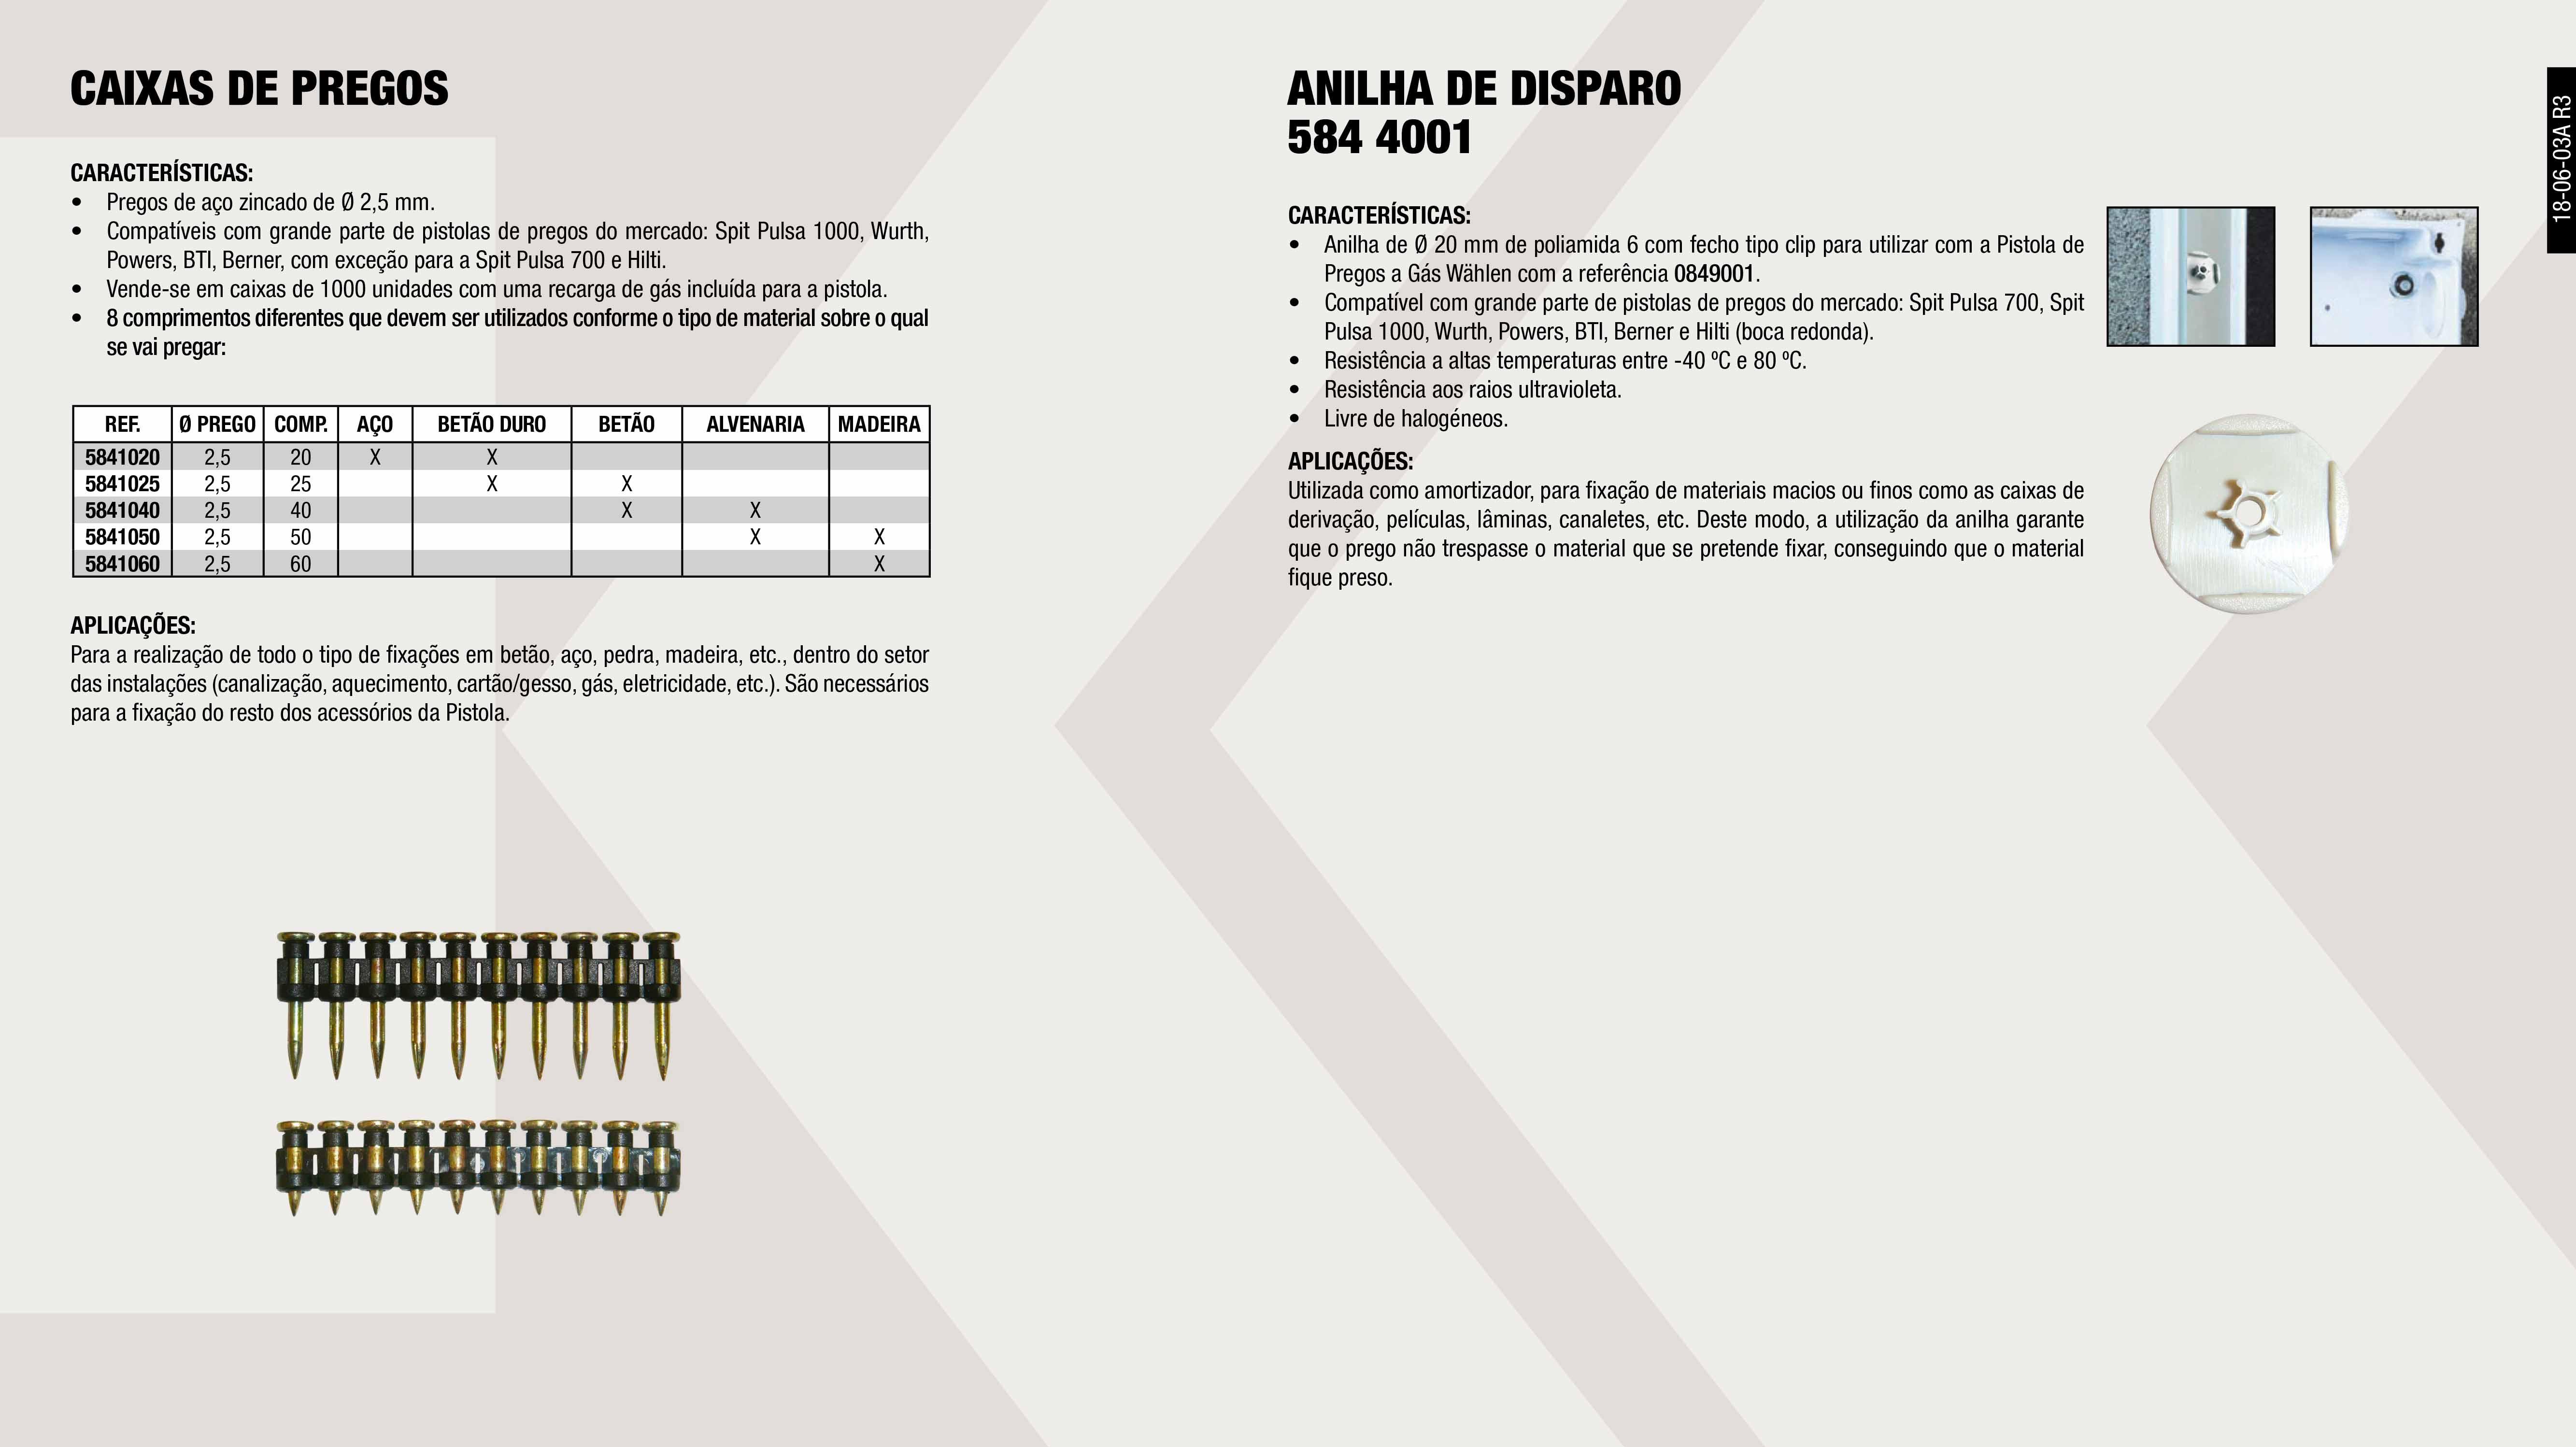 CAIXA 1000 PREGOS 25MM+RECARGA (0849001)                    ,  CAIXA 1000 PREGOS 50MM+RECARGA (0849001)                    ,  CAIXA 1000 PREGOS 40MM+RECARGA (0849001)                    ,  CAIXA 1000 PREGOS 30MM+RECARGA (0849001)                    ,  CAIXA 1000 PREGOS 60MM+RECARGA (0849001)                    ,  CAIXA 1000 PREGOS 20MM+RECARGA (0849001)                    ,  ARANDELA CINZENTO (0849001)                                 ,